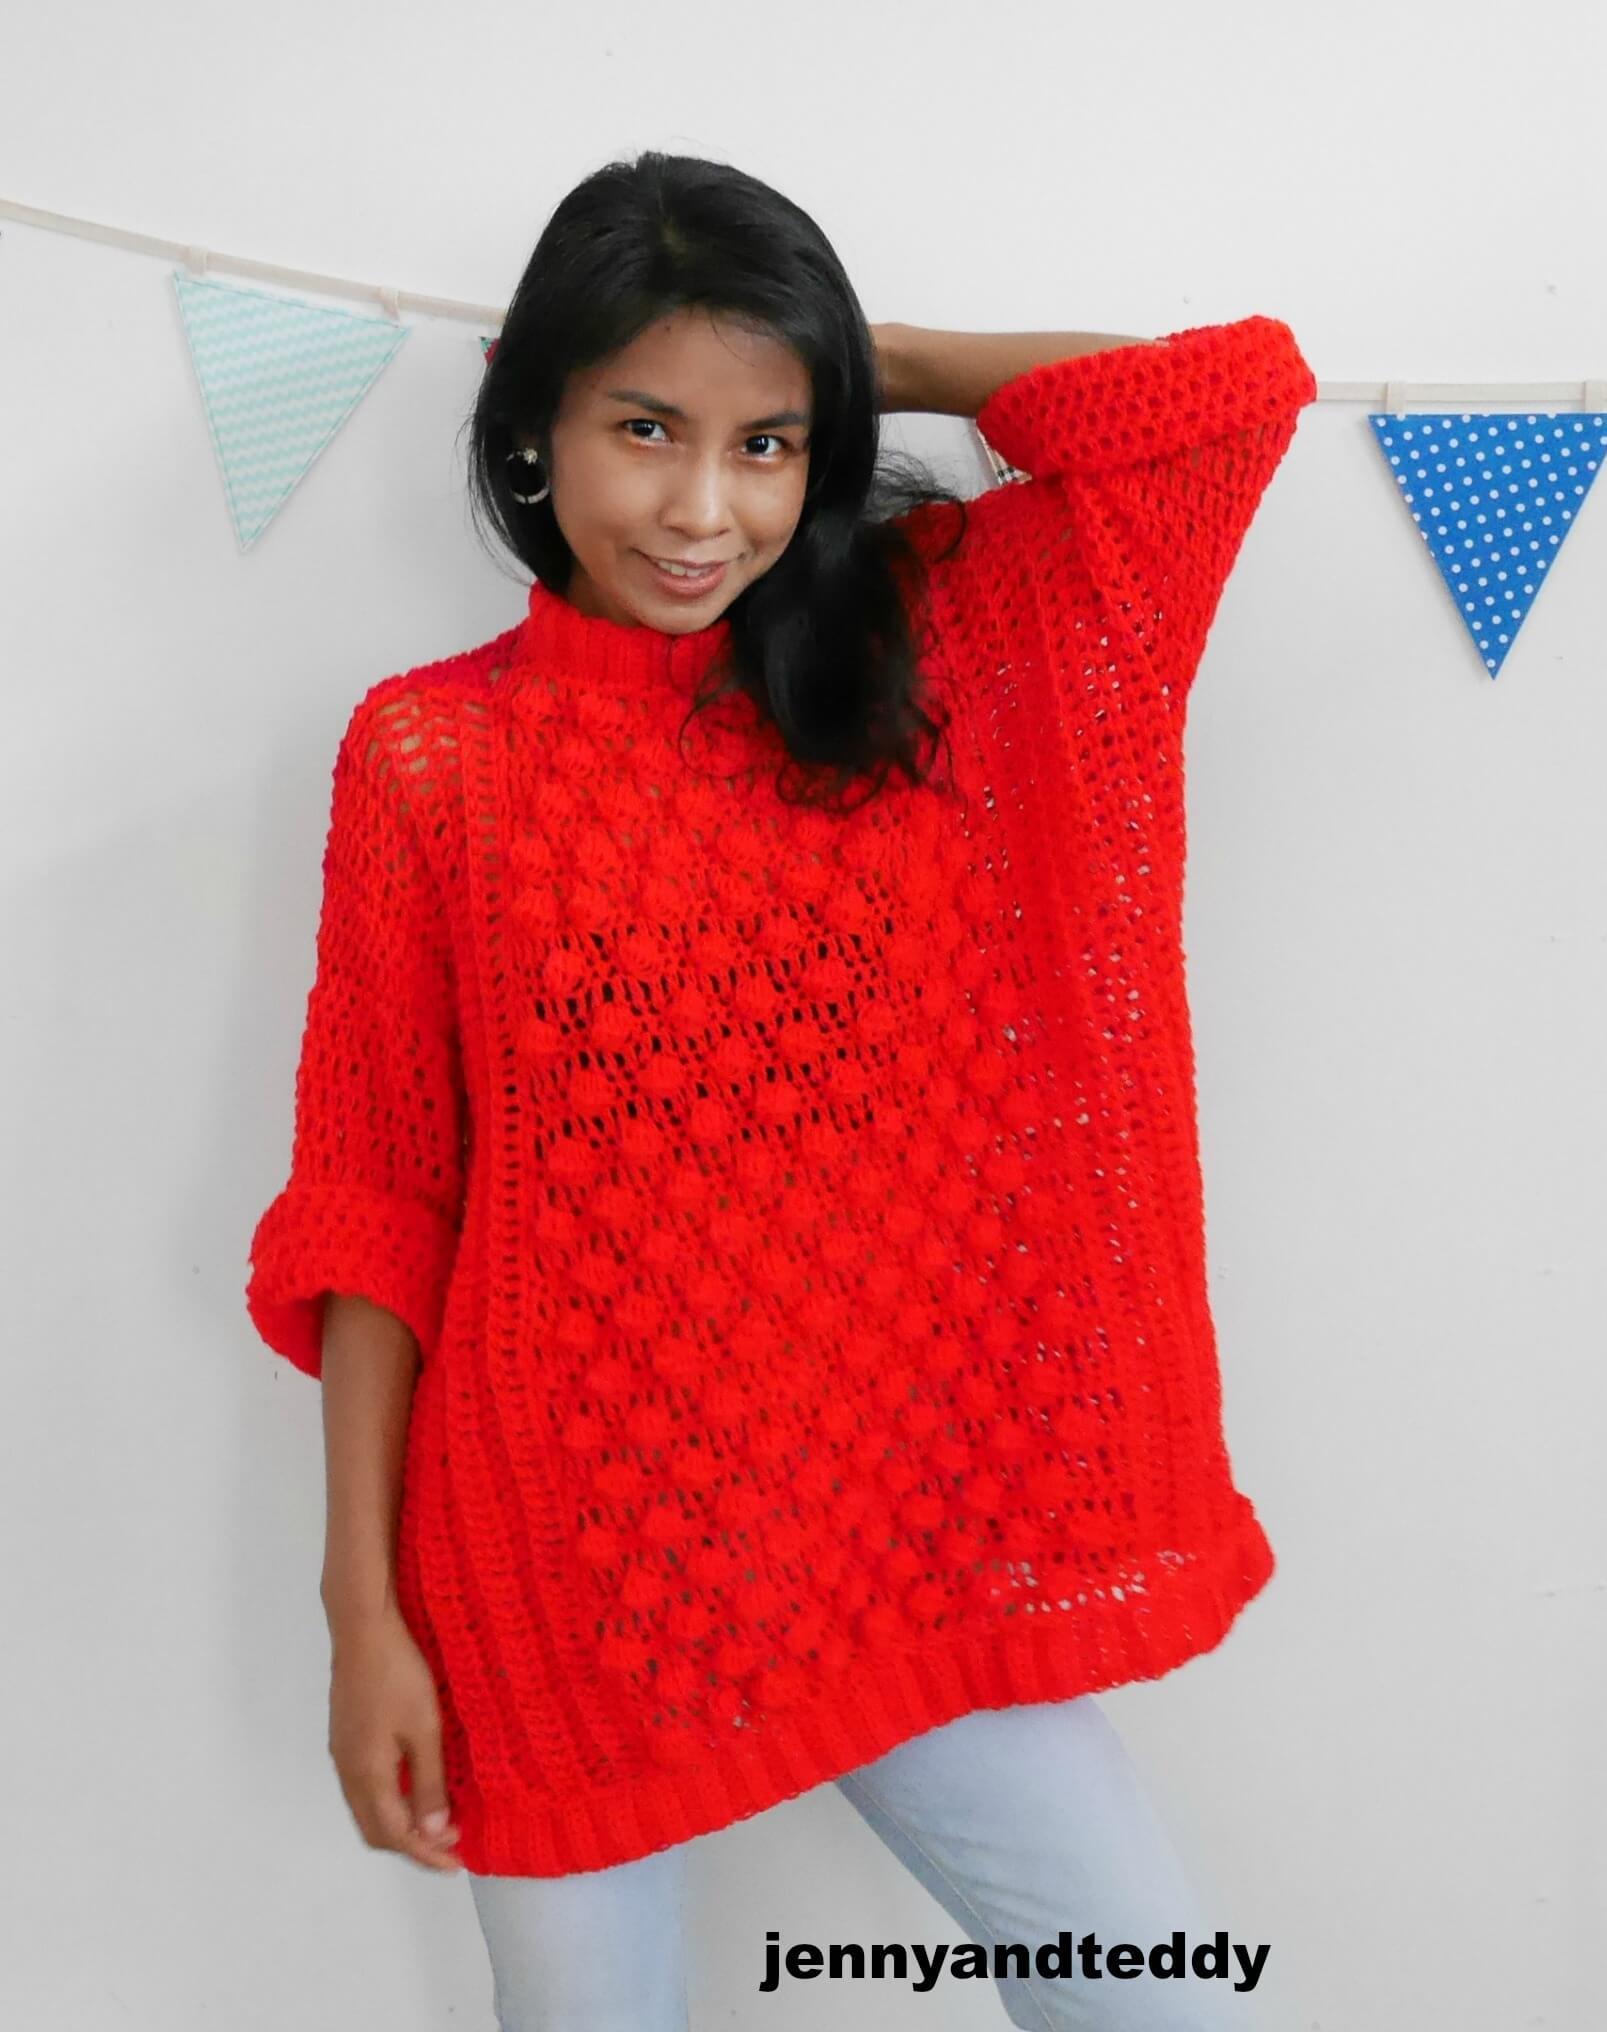 crochet sweater useing bobble stitch